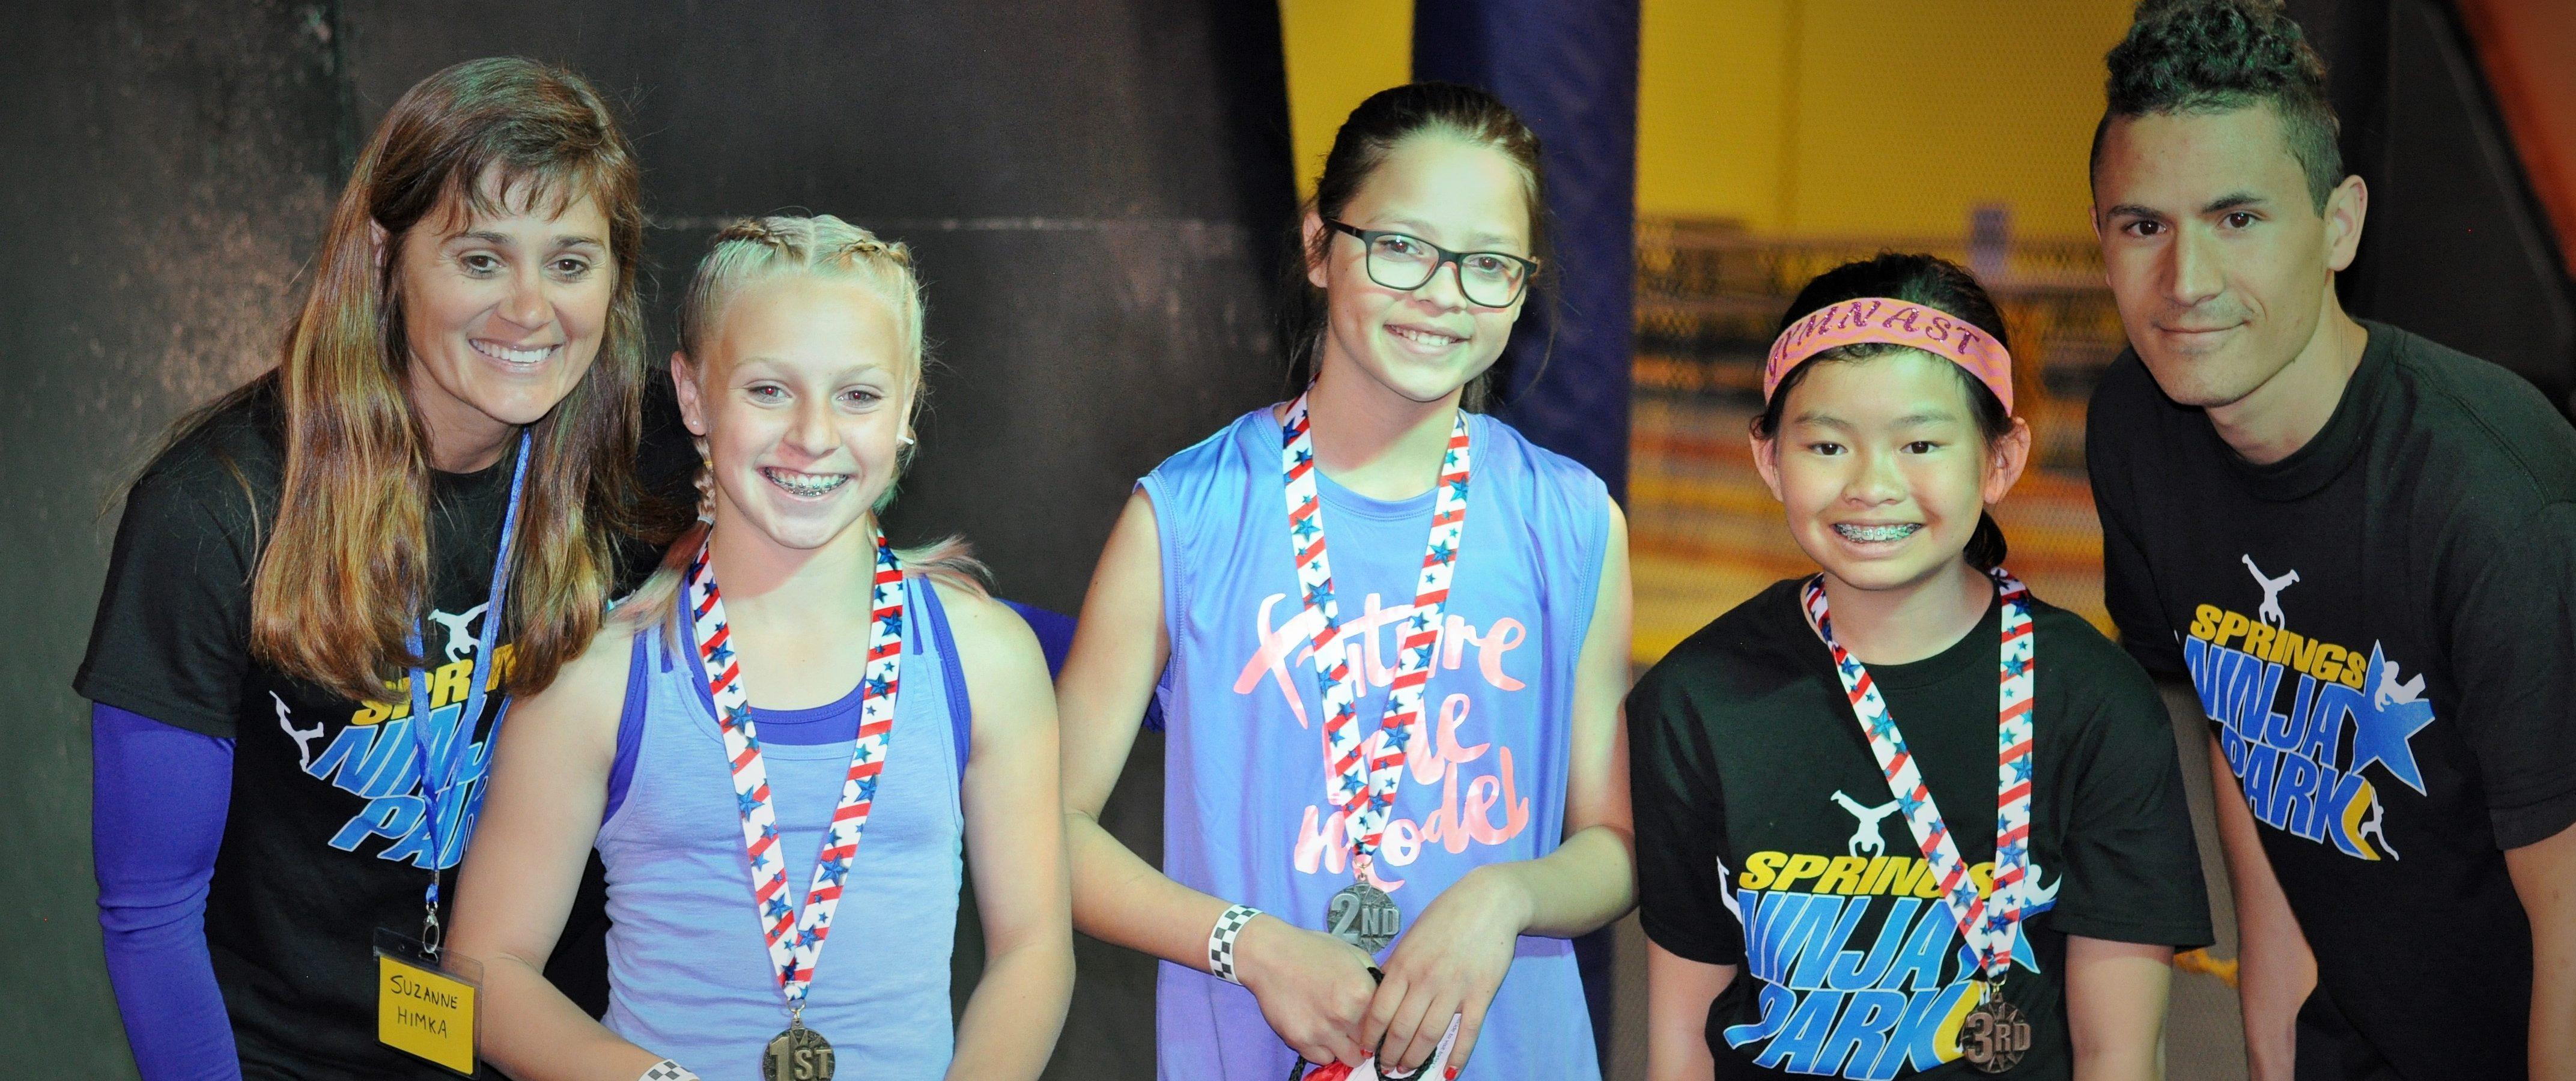 Awards for Kid Ninja Warriors at Springs Adventure Park, COlorado SPrings, CO